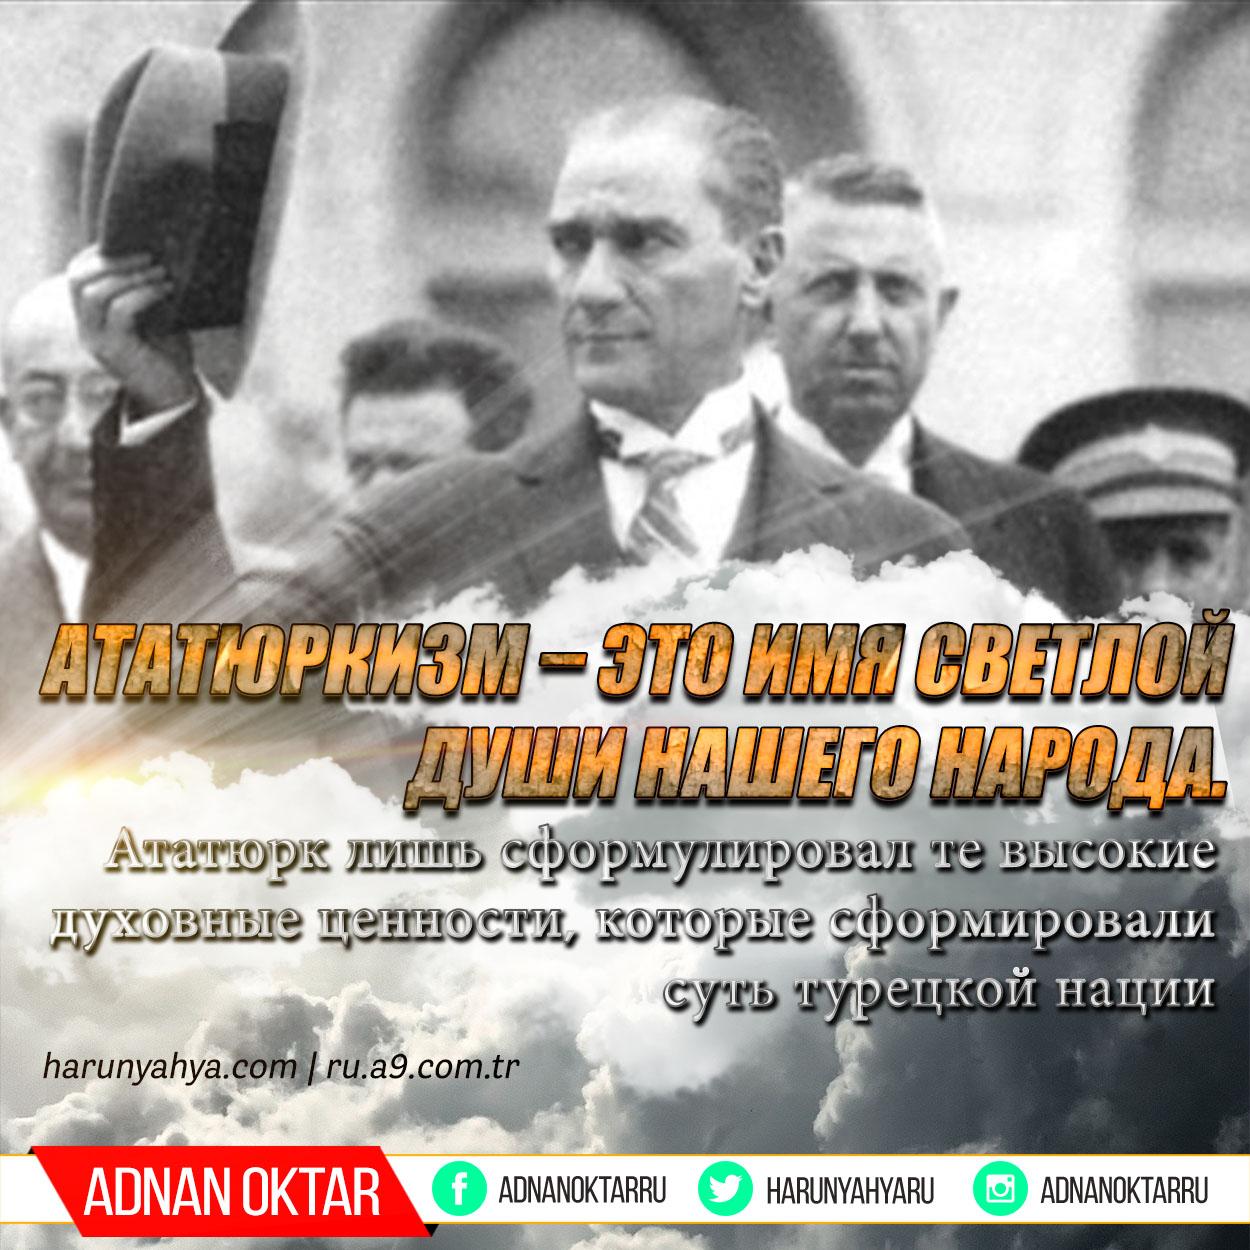 "<table style=""width: 100%;""><tr><td style=""vertical-align: middle;"">Ататюркизм – это имя светлой души нашего народа. Ататюрк лишь сформулировал те высокие духовные ценности, которые сформировали суть турецкой нации</td><td style=""max-width: 70px;vertical-align: middle;""> <a href=""/downloadquote.php?filename=1490773081968.jpg""><img class=""hoversaturate"" height=""20px"" src=""/assets/images/download-iconu.png"" style=""width: 48px; height: 48px;"" title=""Download Image""/></a></td></tr></table>"